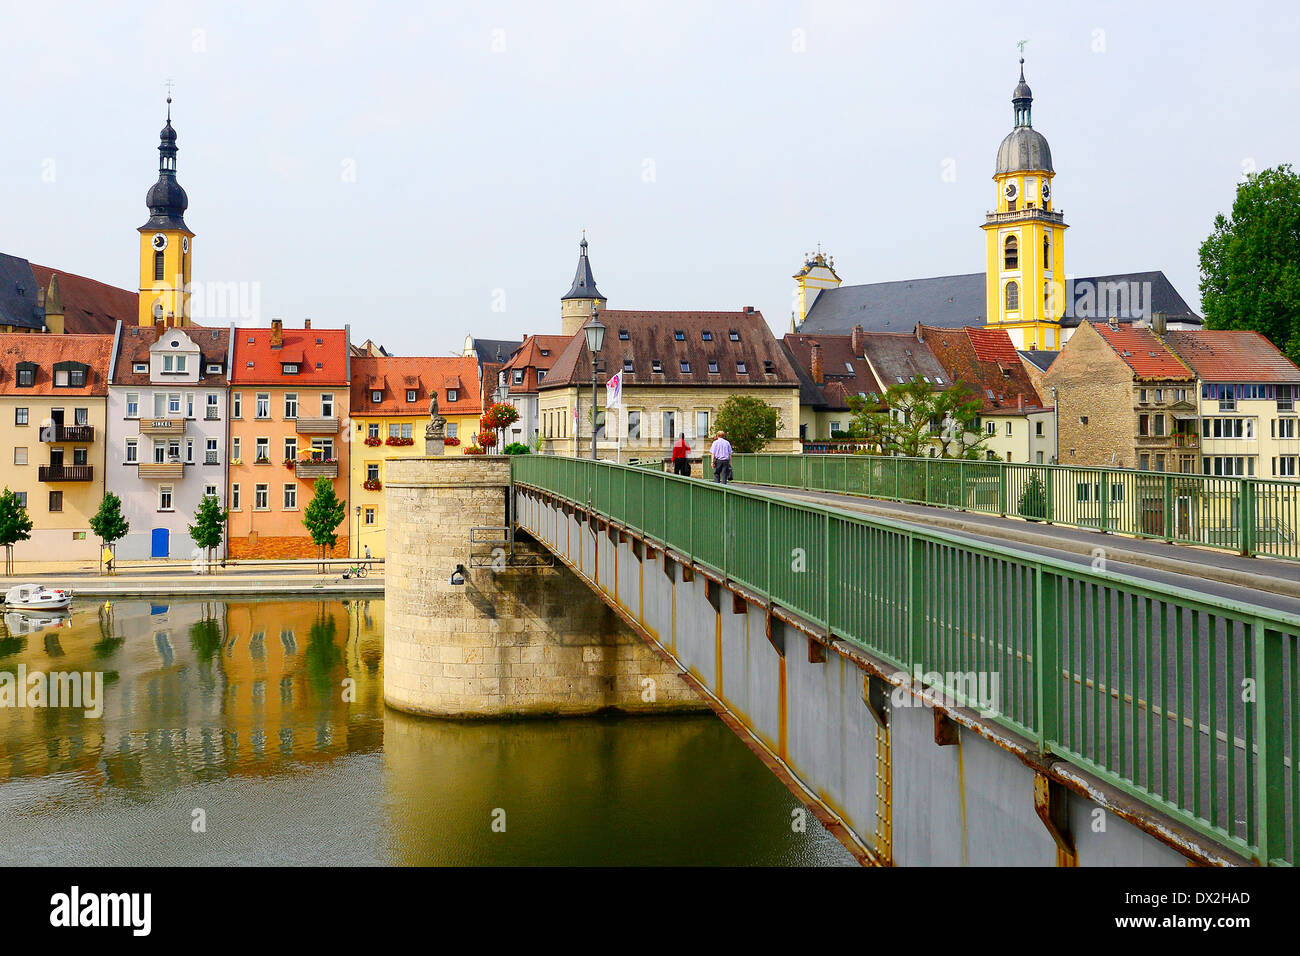 Bridge Main River Kitzingen Germany Stockfotos & Bridge